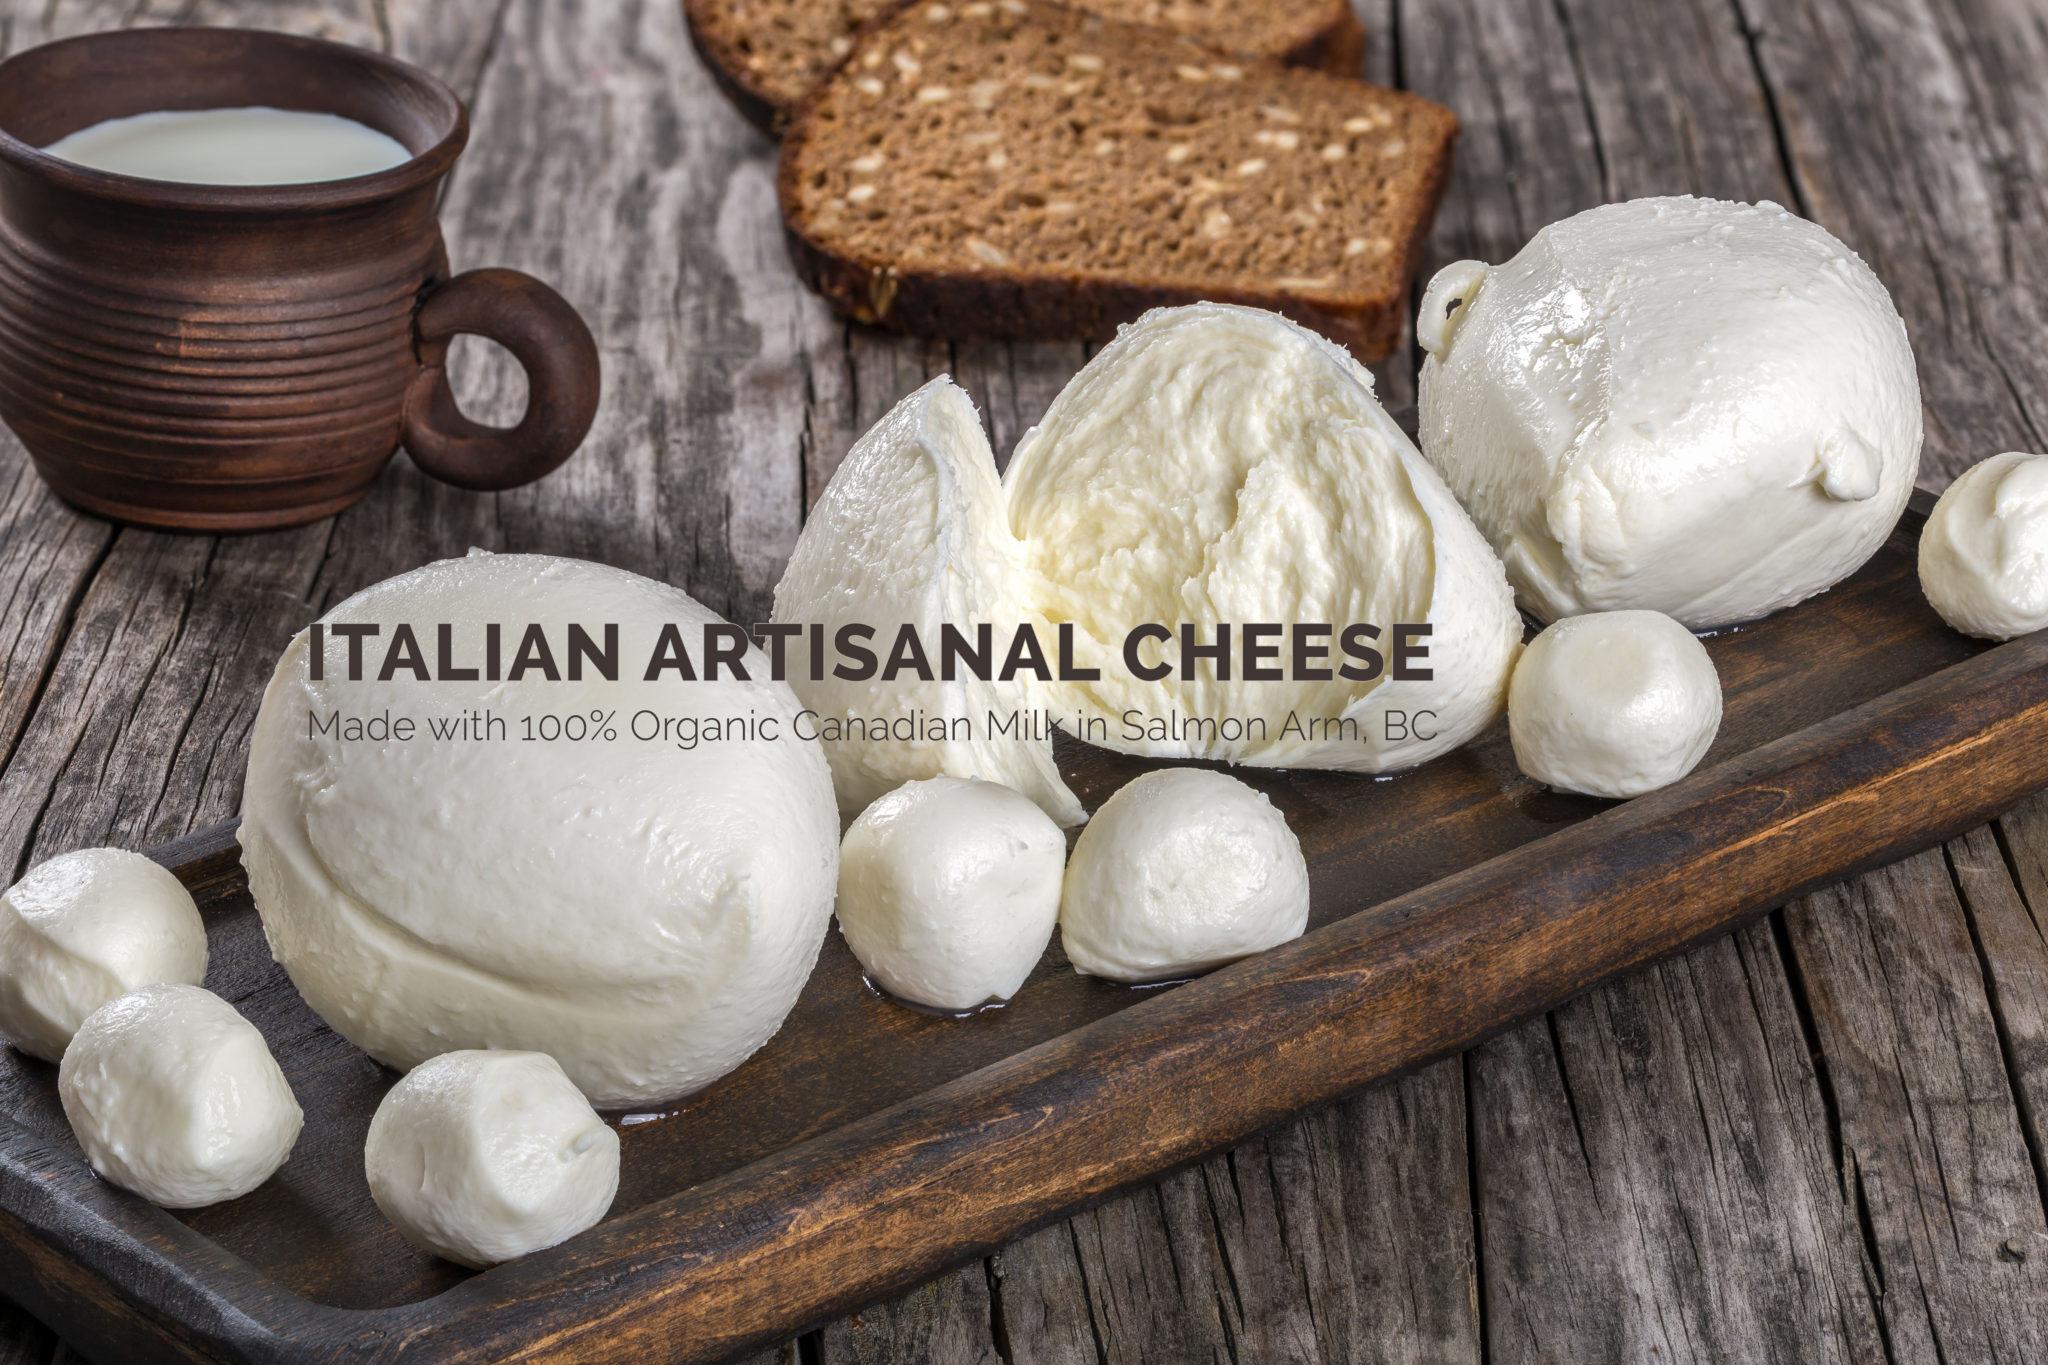 Italian Artisanal Cheese in Salmon Arm